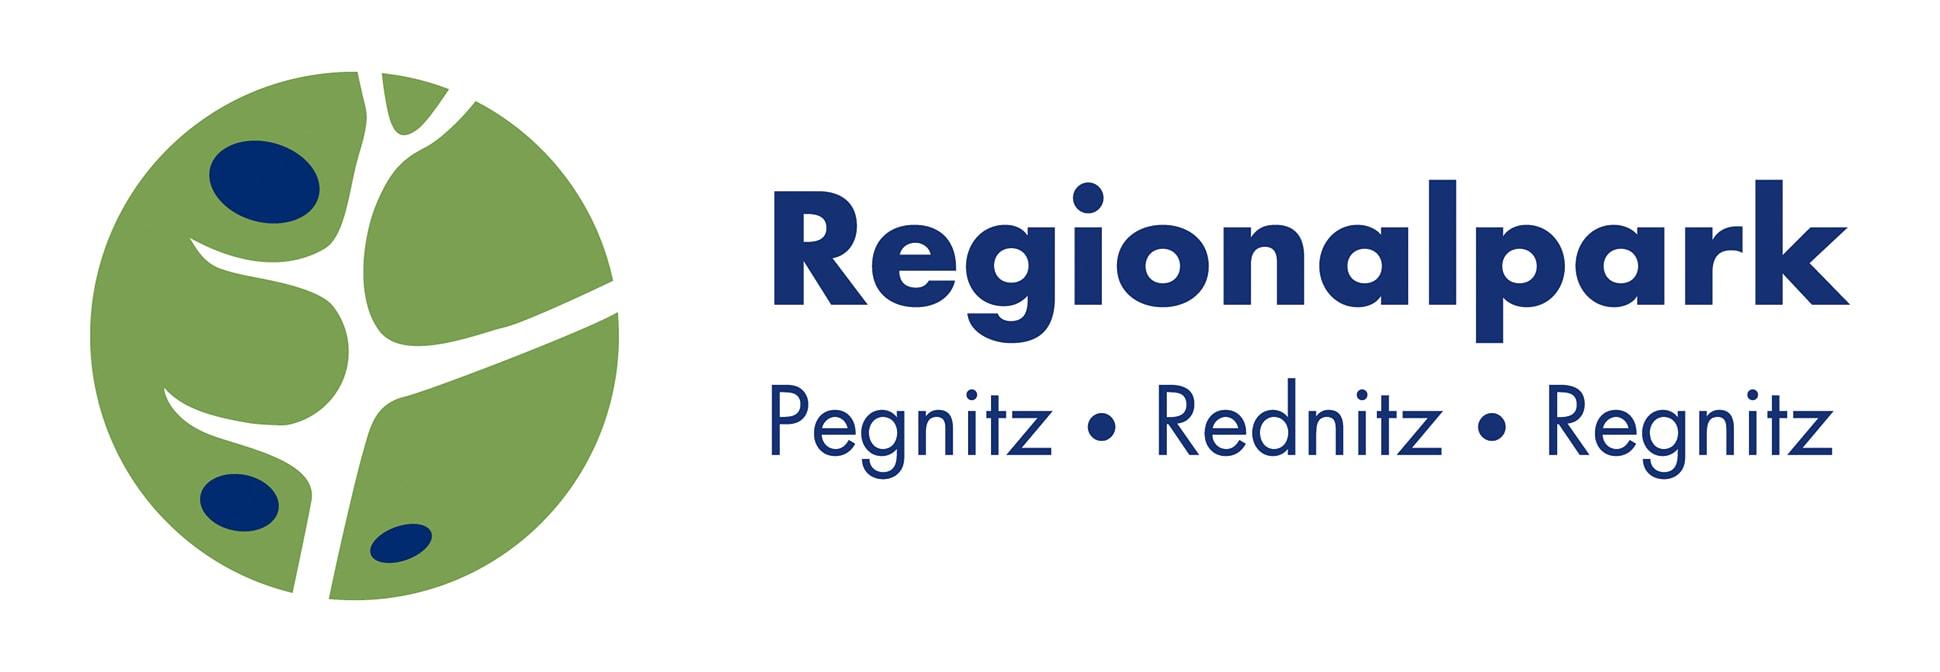 Regionalpark Logo